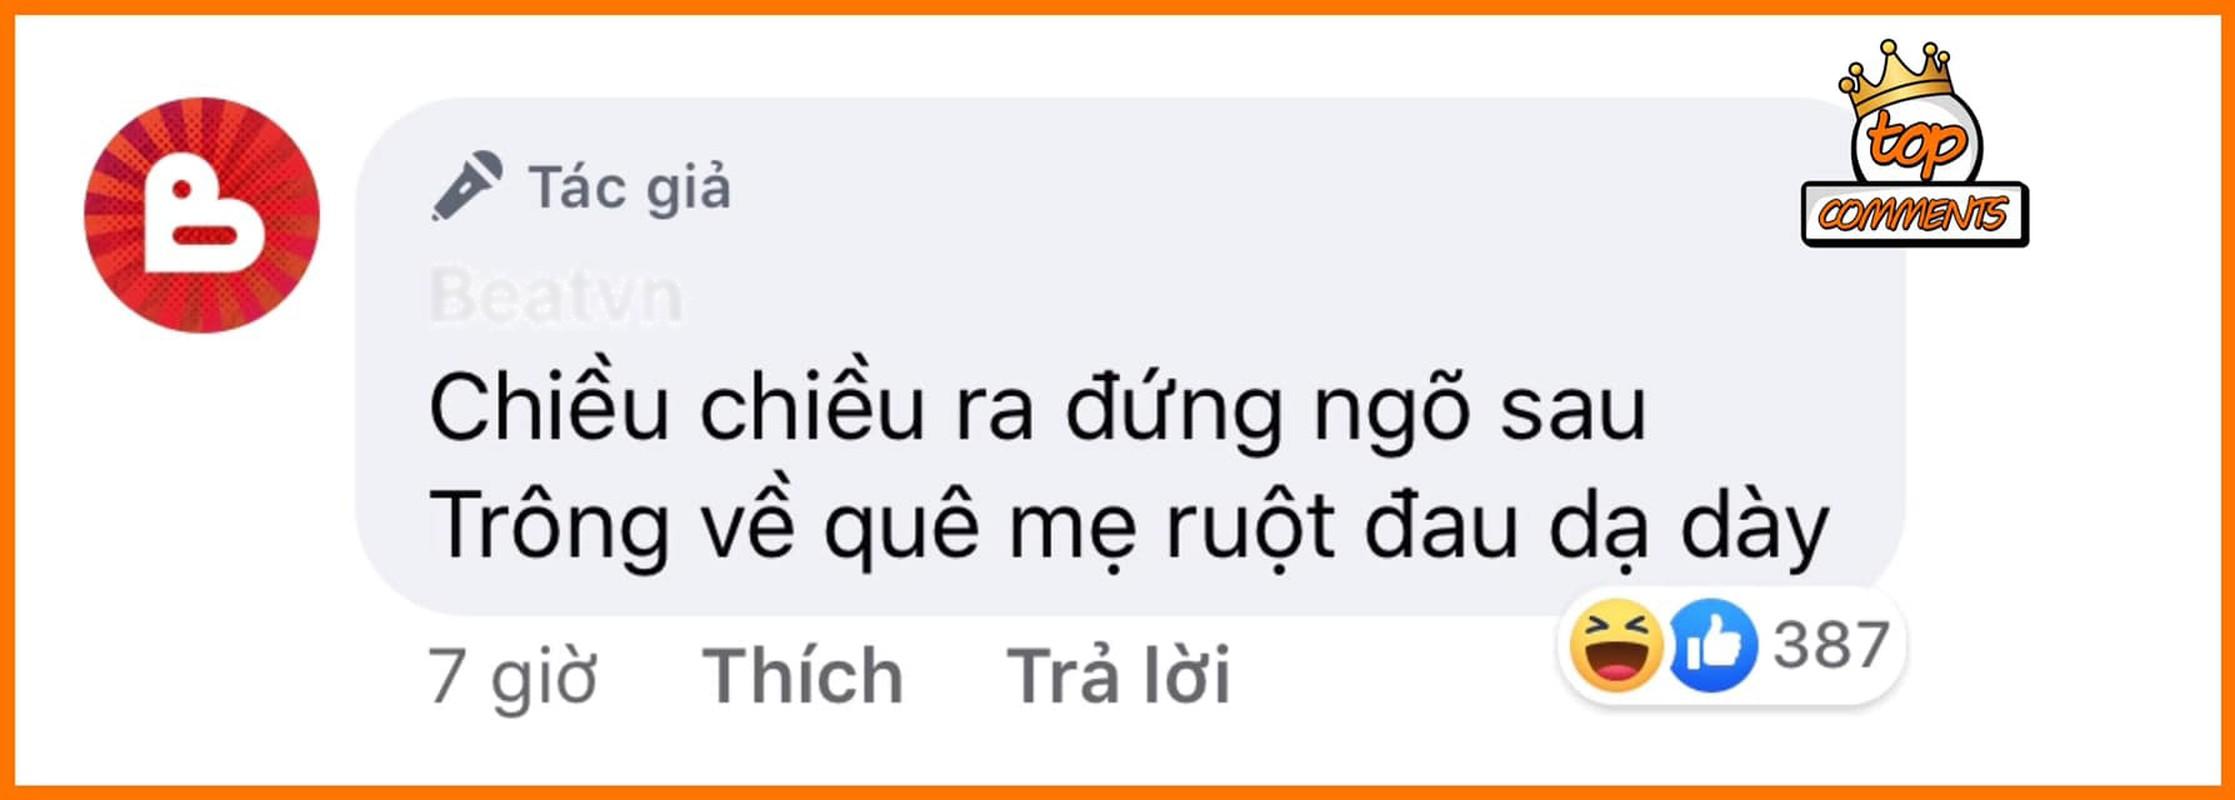 The hien tai lam tho, dan mang khien nguoi doc vang dau ngay lap tuc-Hinh-2